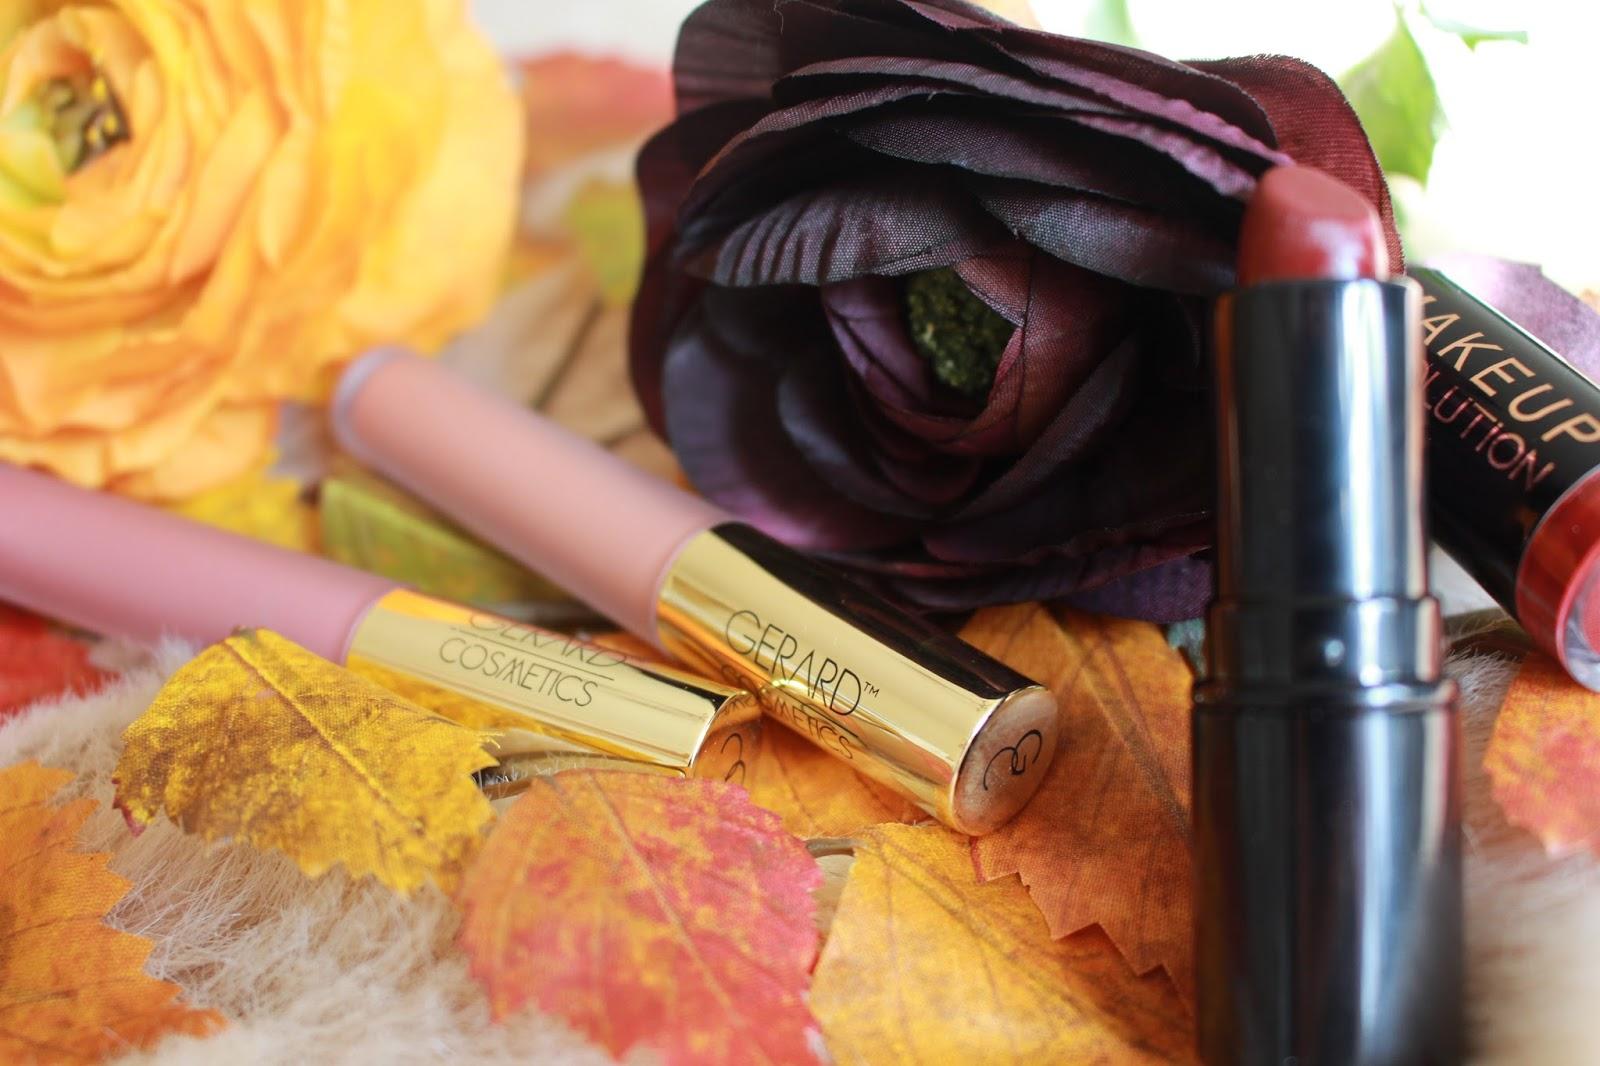 Gerard Cosmetics Matte Lip